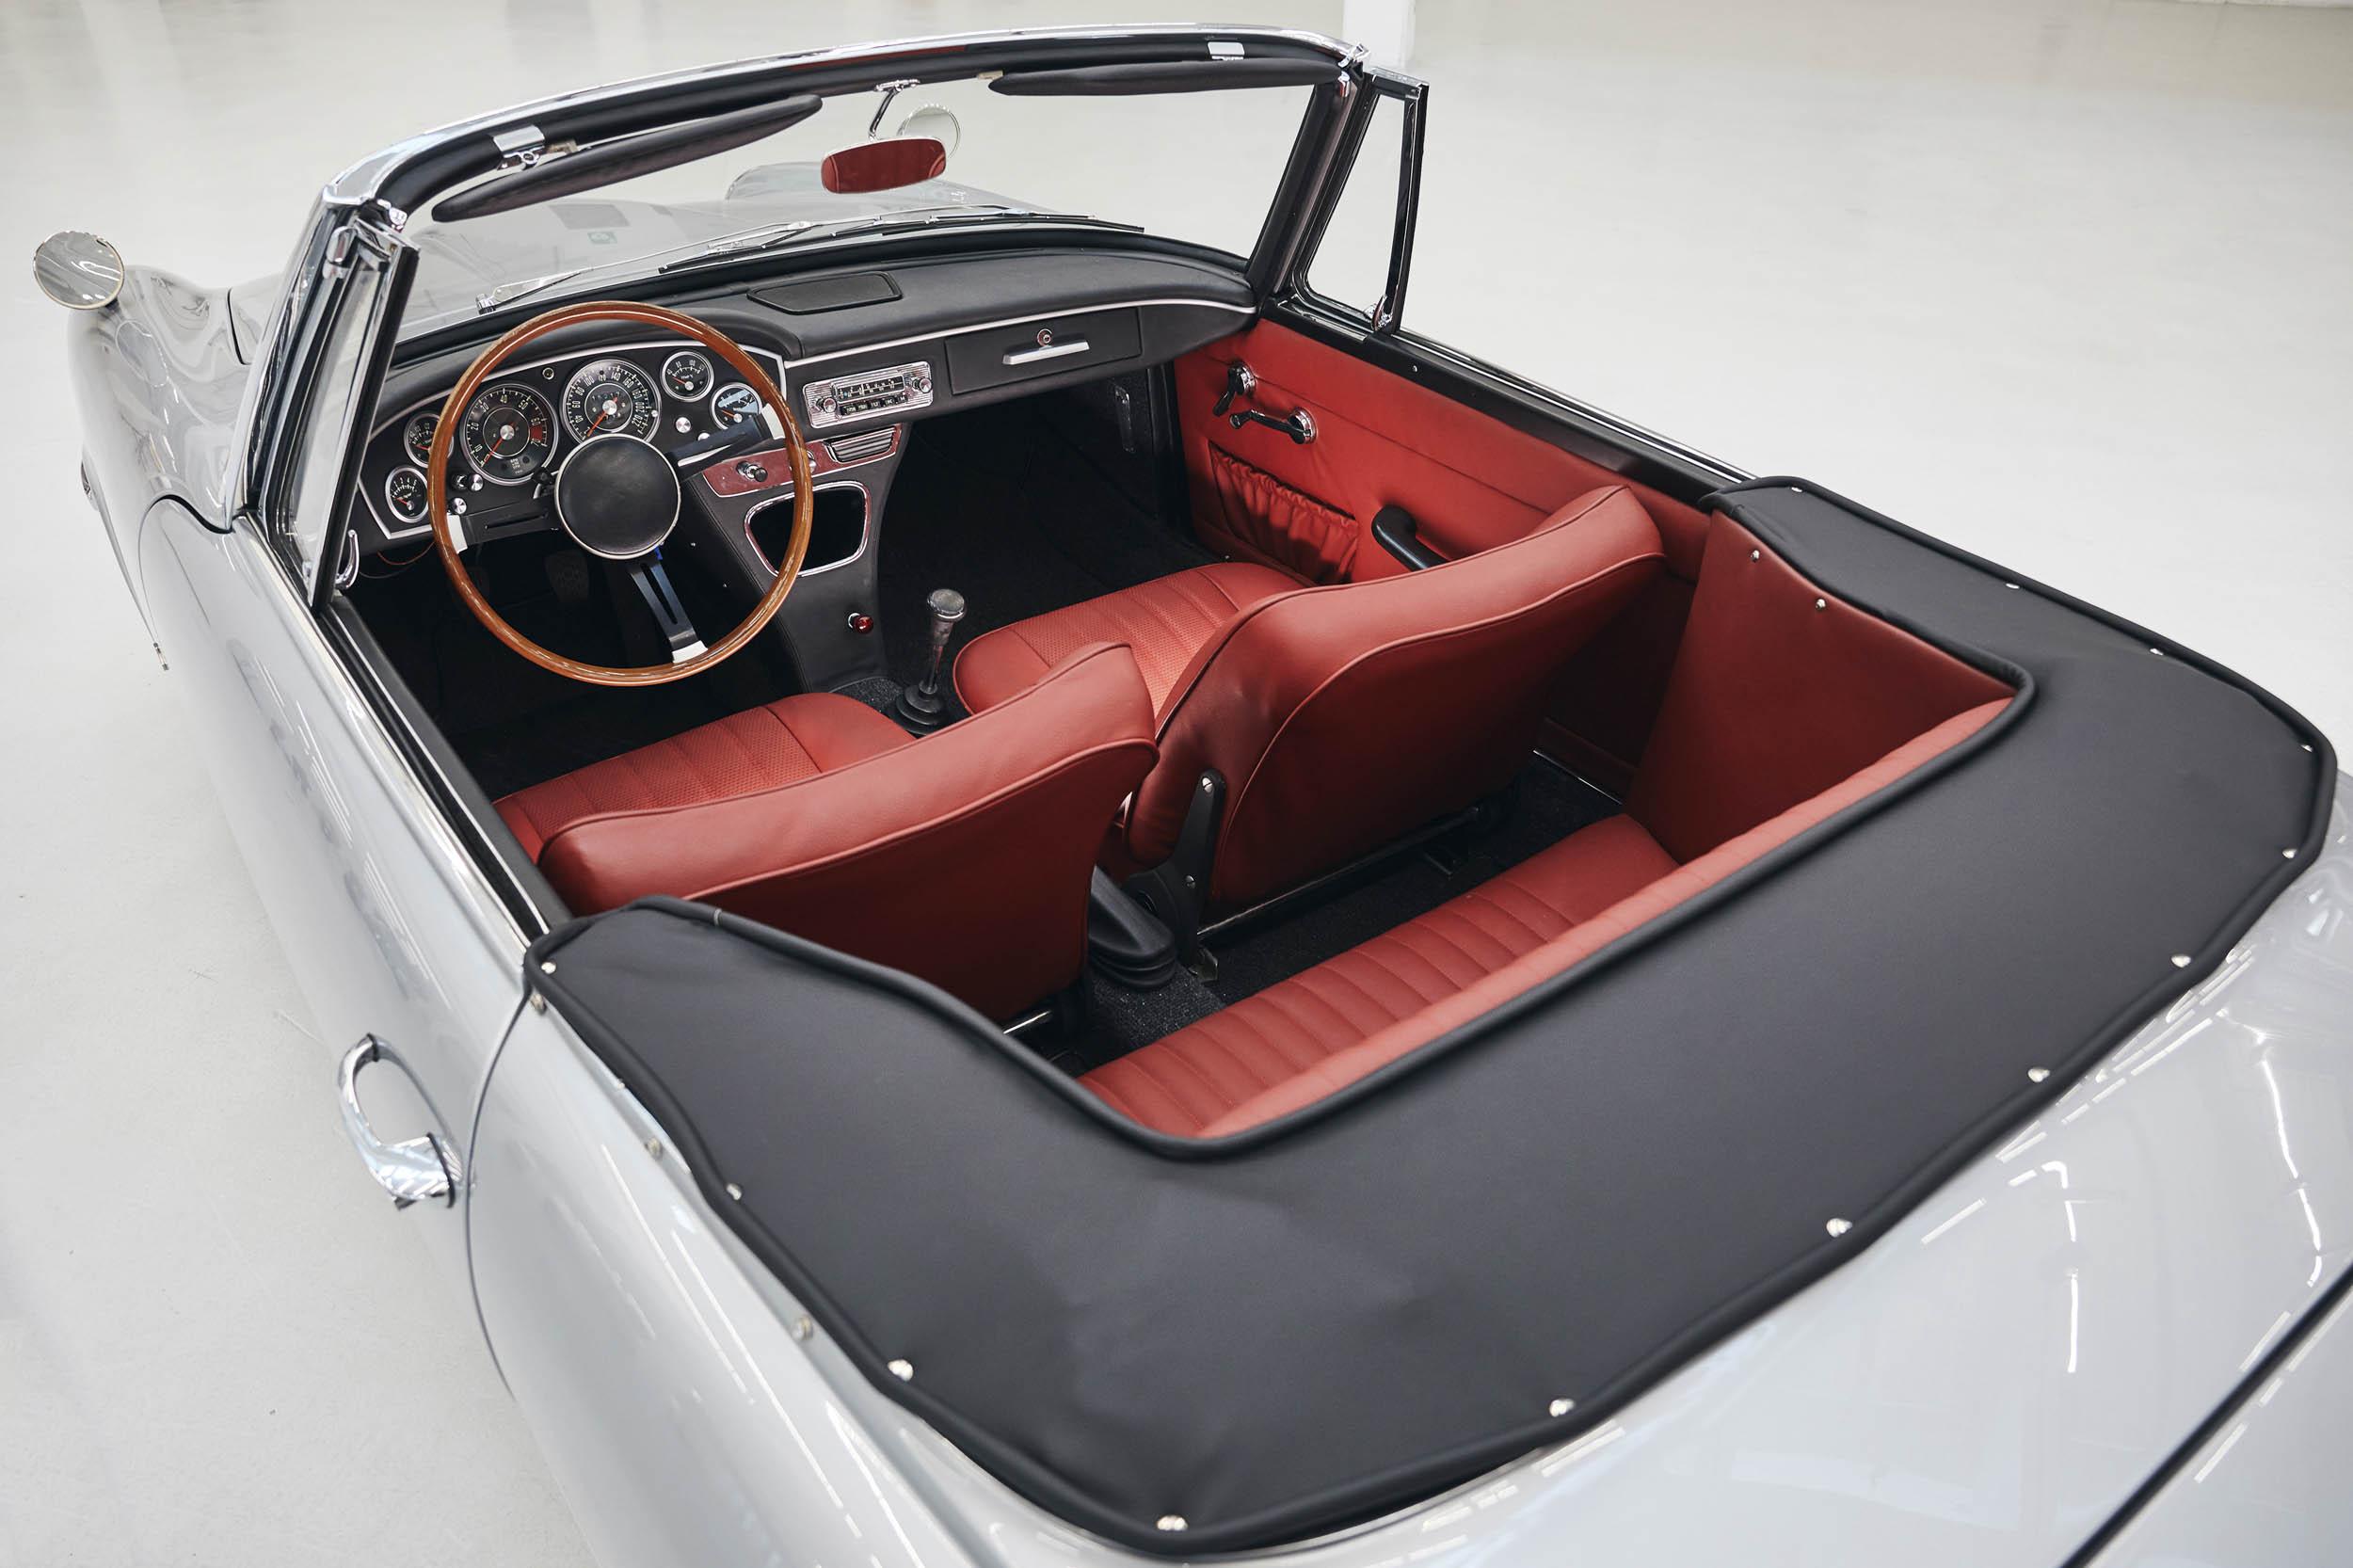 BMW 1600 GT convertible interior